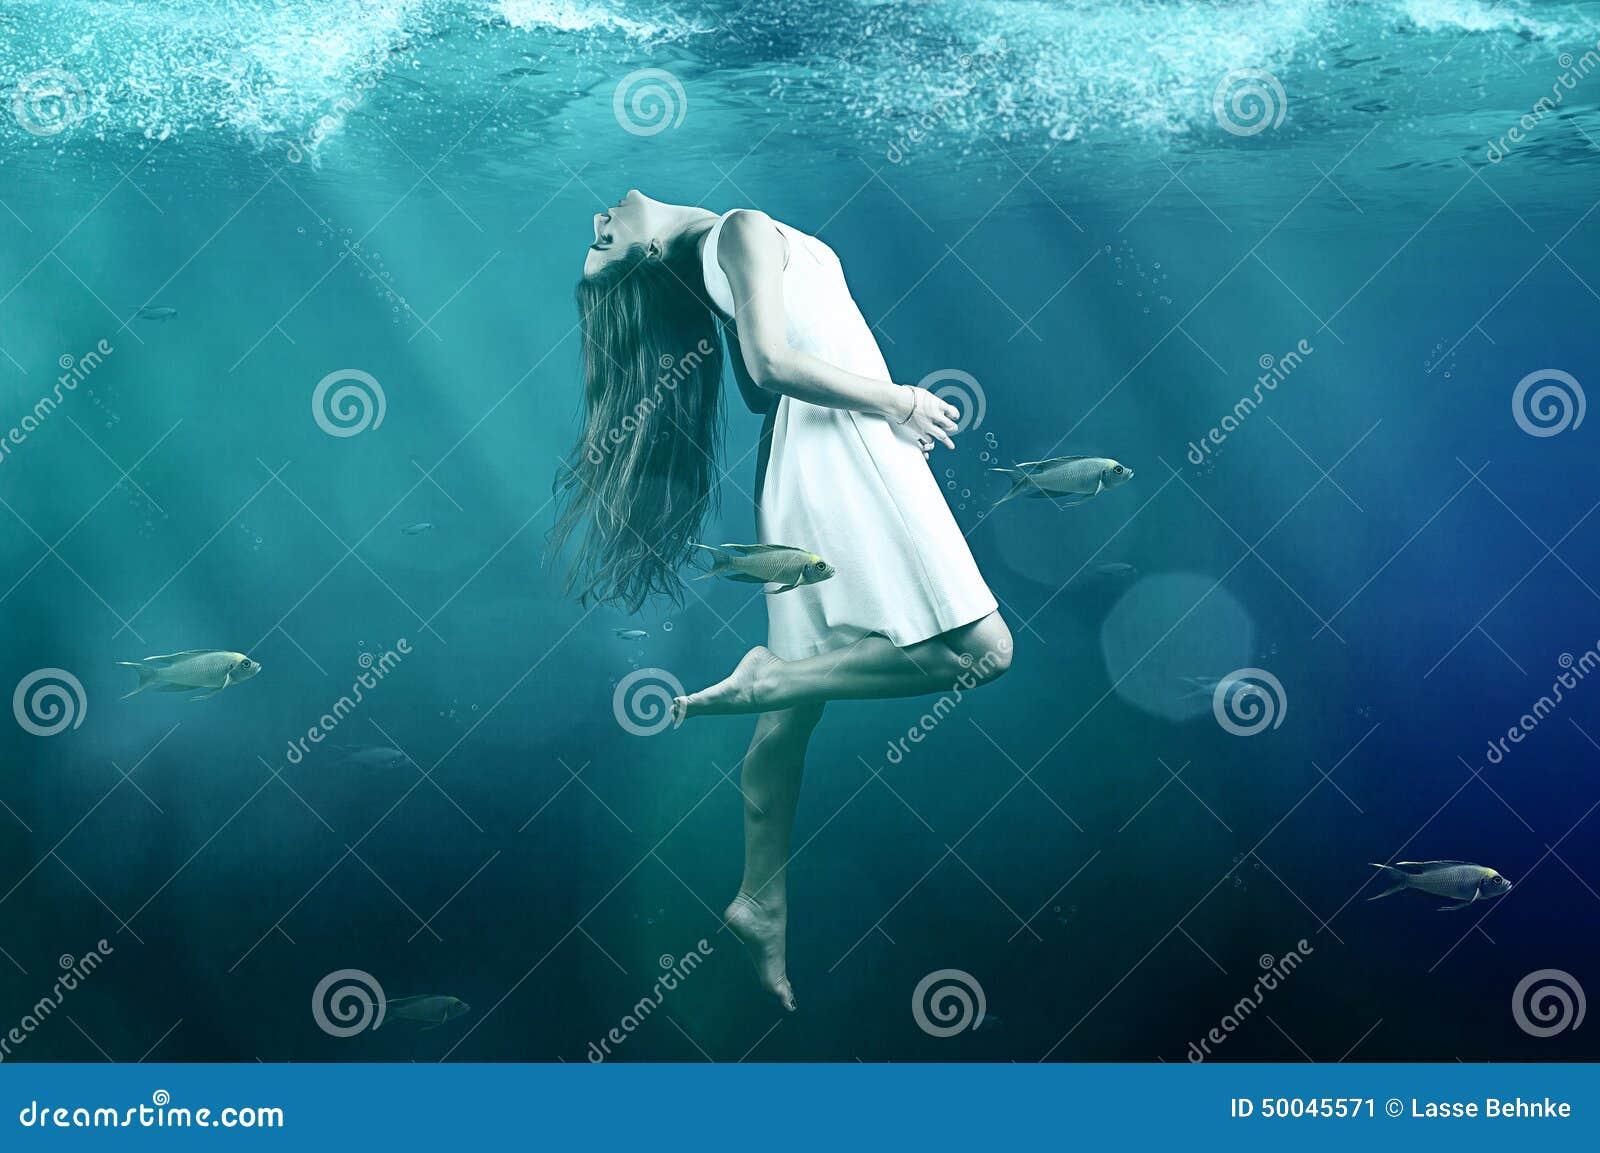 Underwater Stock Photo - Image: 50045571